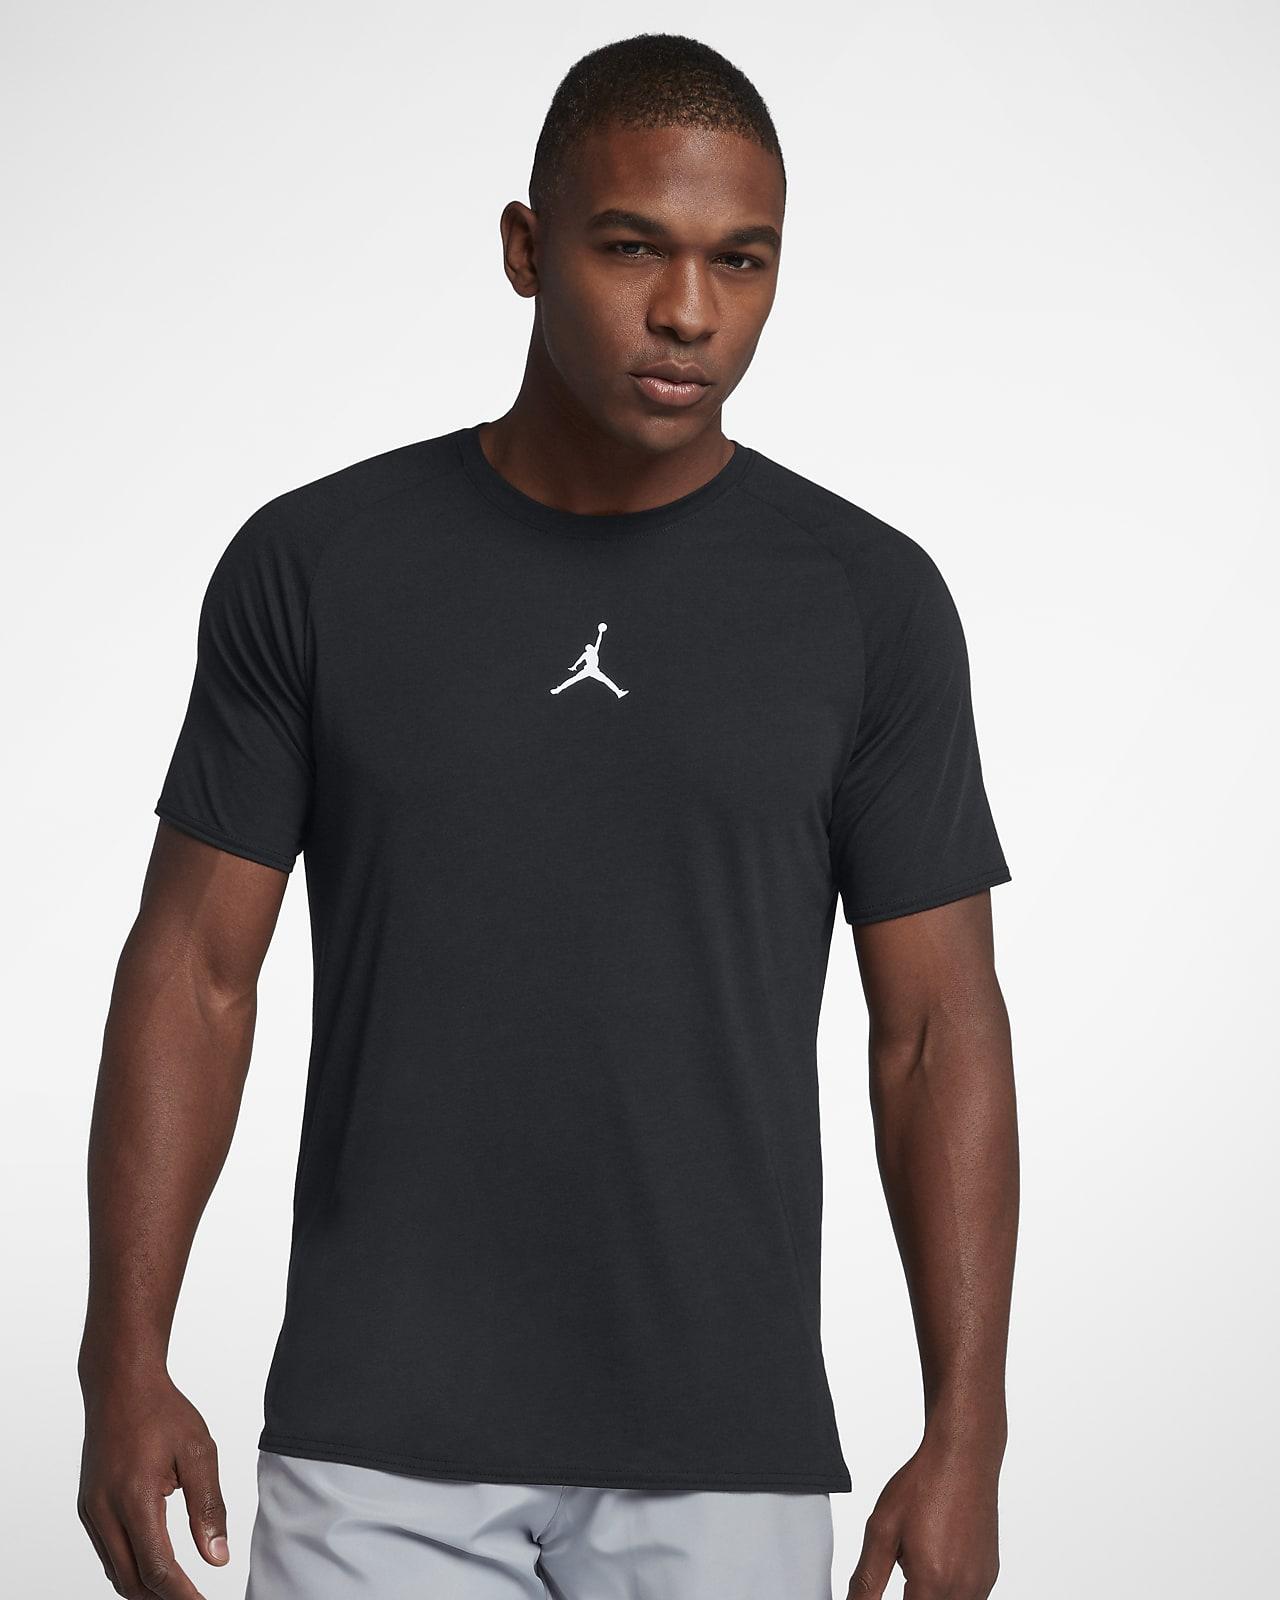 Short-Sleeve Training Top. Nike SG